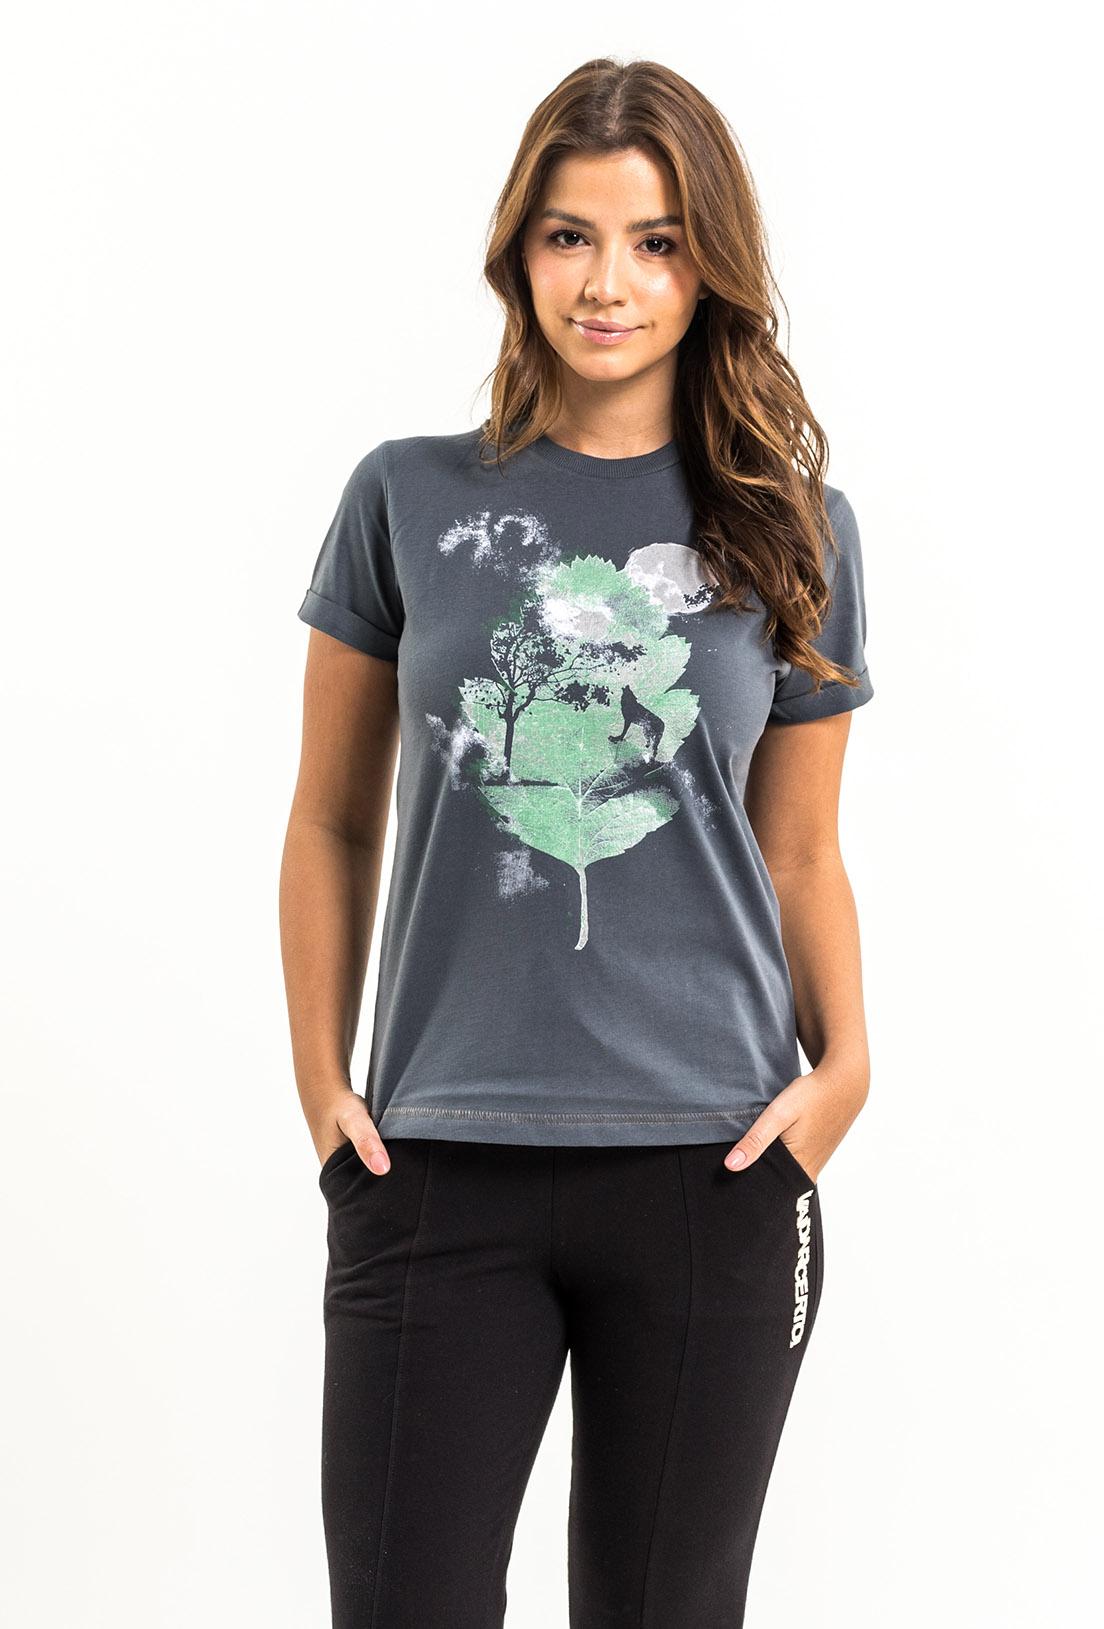 T-shirt Nogah Winter Leaf Chumbo